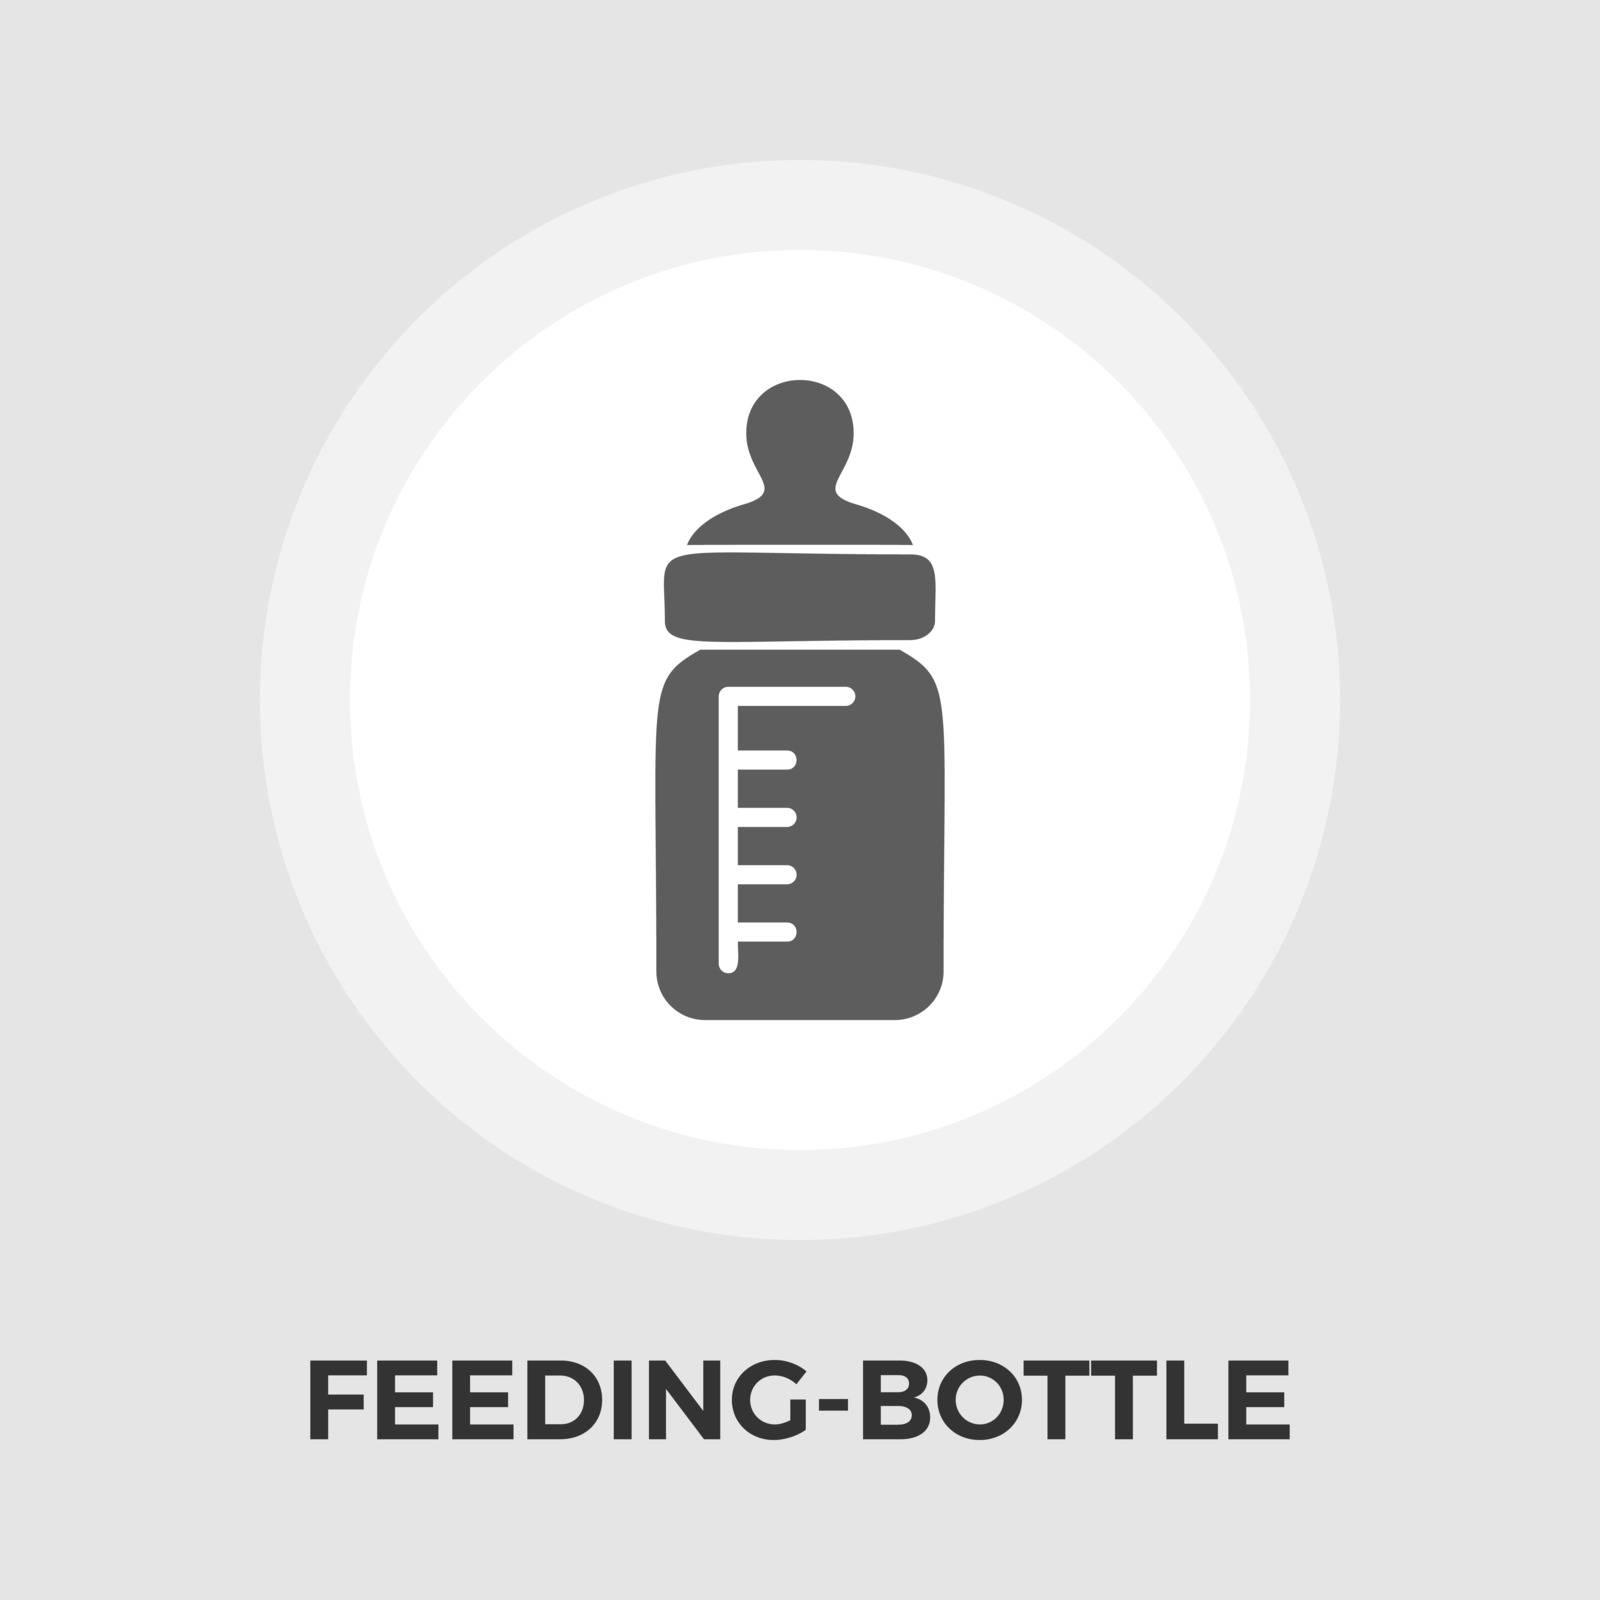 Feeding bottle icon vector. Flat icon isolated on the white background. Editable EPS file. Vector illustration.